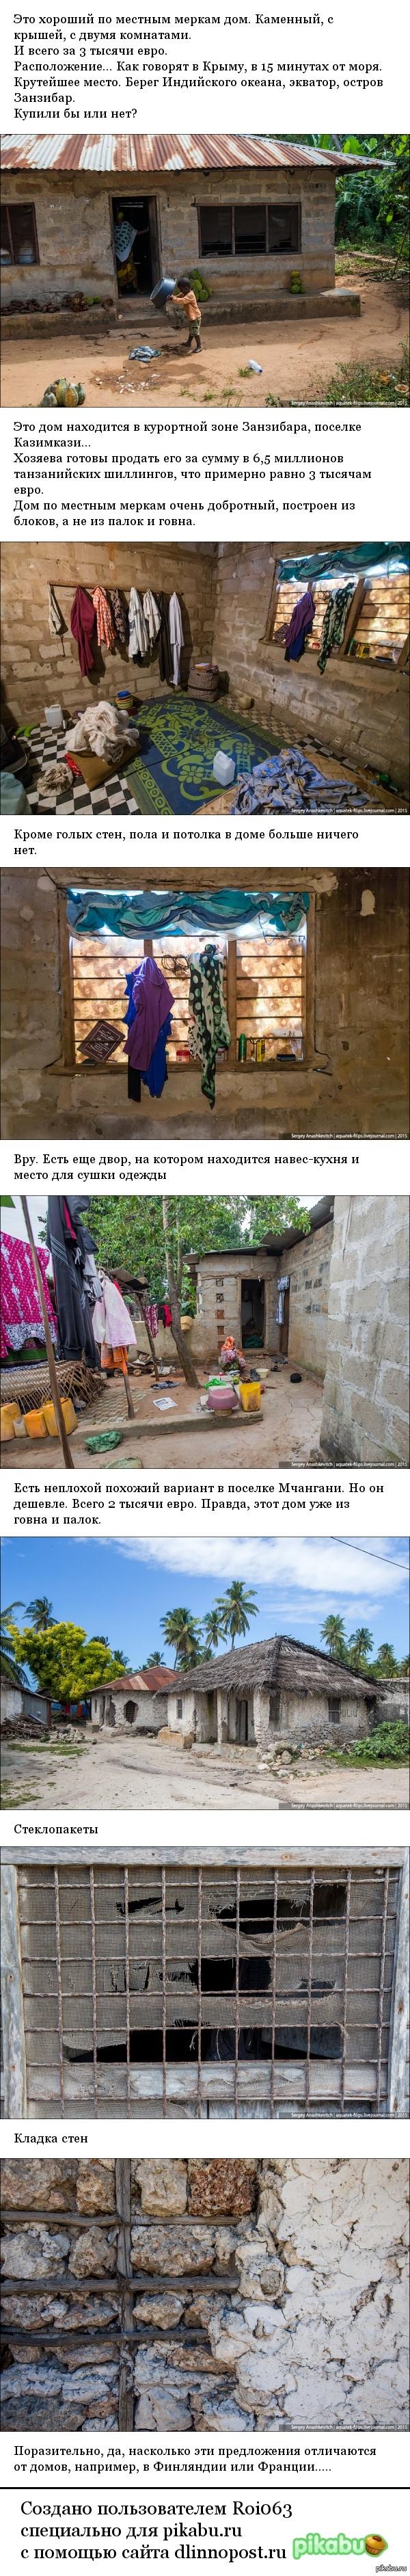 Дом на Занзибаре за 3 тысячи евро. Да или нет? источник: http://aquatek-filips.livejournal.com/953680.html